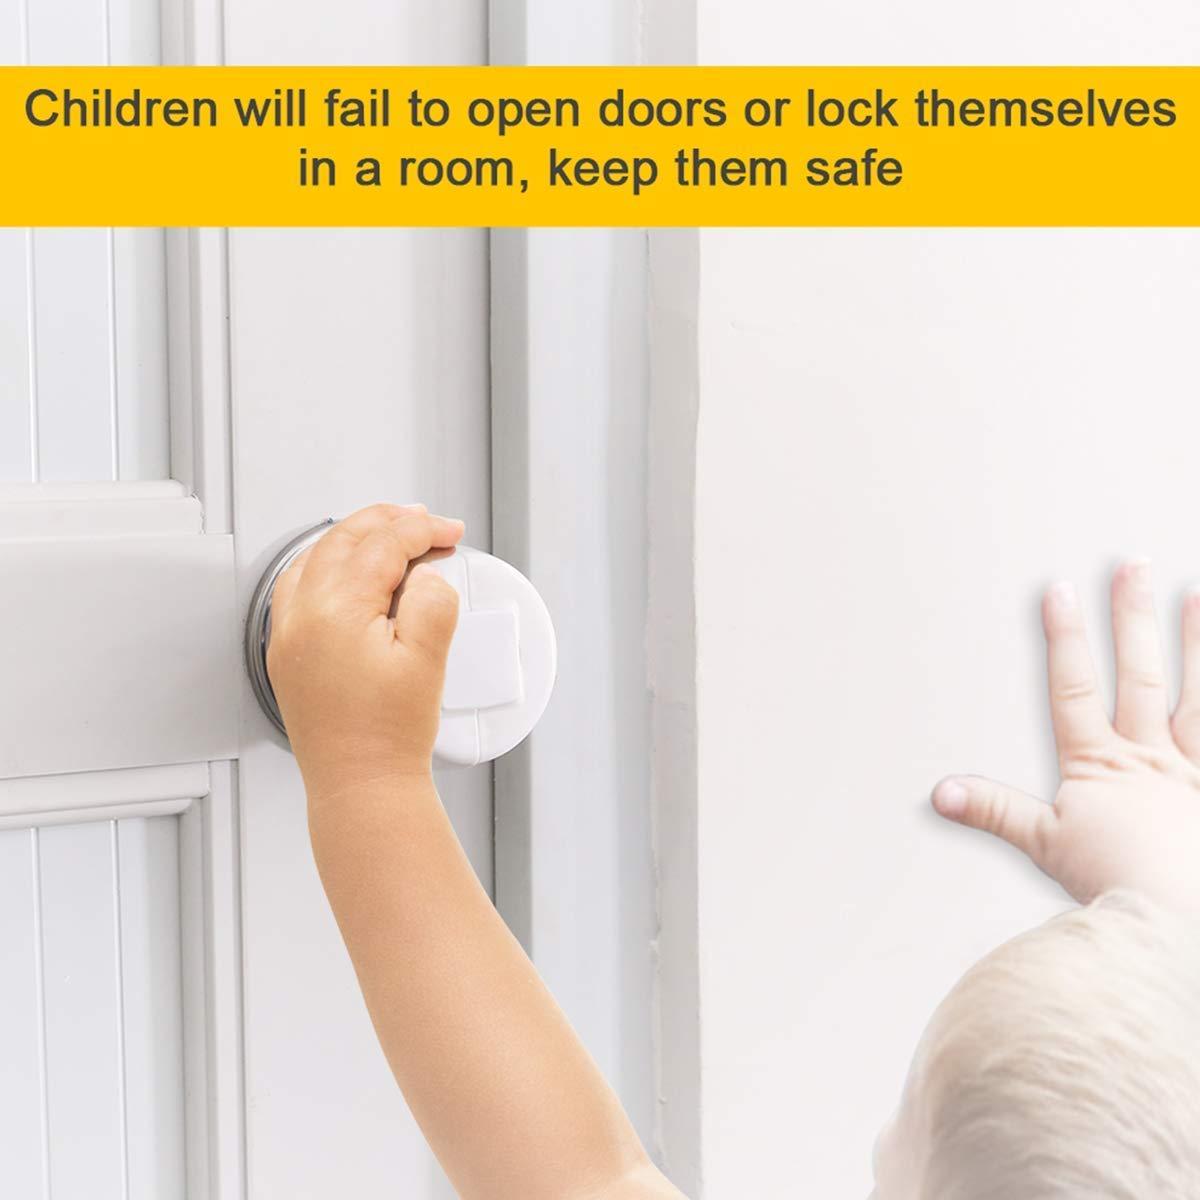 2019 Upgrade BOOGO Child Safety Cupboard Lock Stick On Child Lock for Kitchen Cupboard Self Adhesive Baby Proofing Cabinet Latch Children Proof Latch for Door,Drawer,Closet,Fridge,Refrigerator,Trash